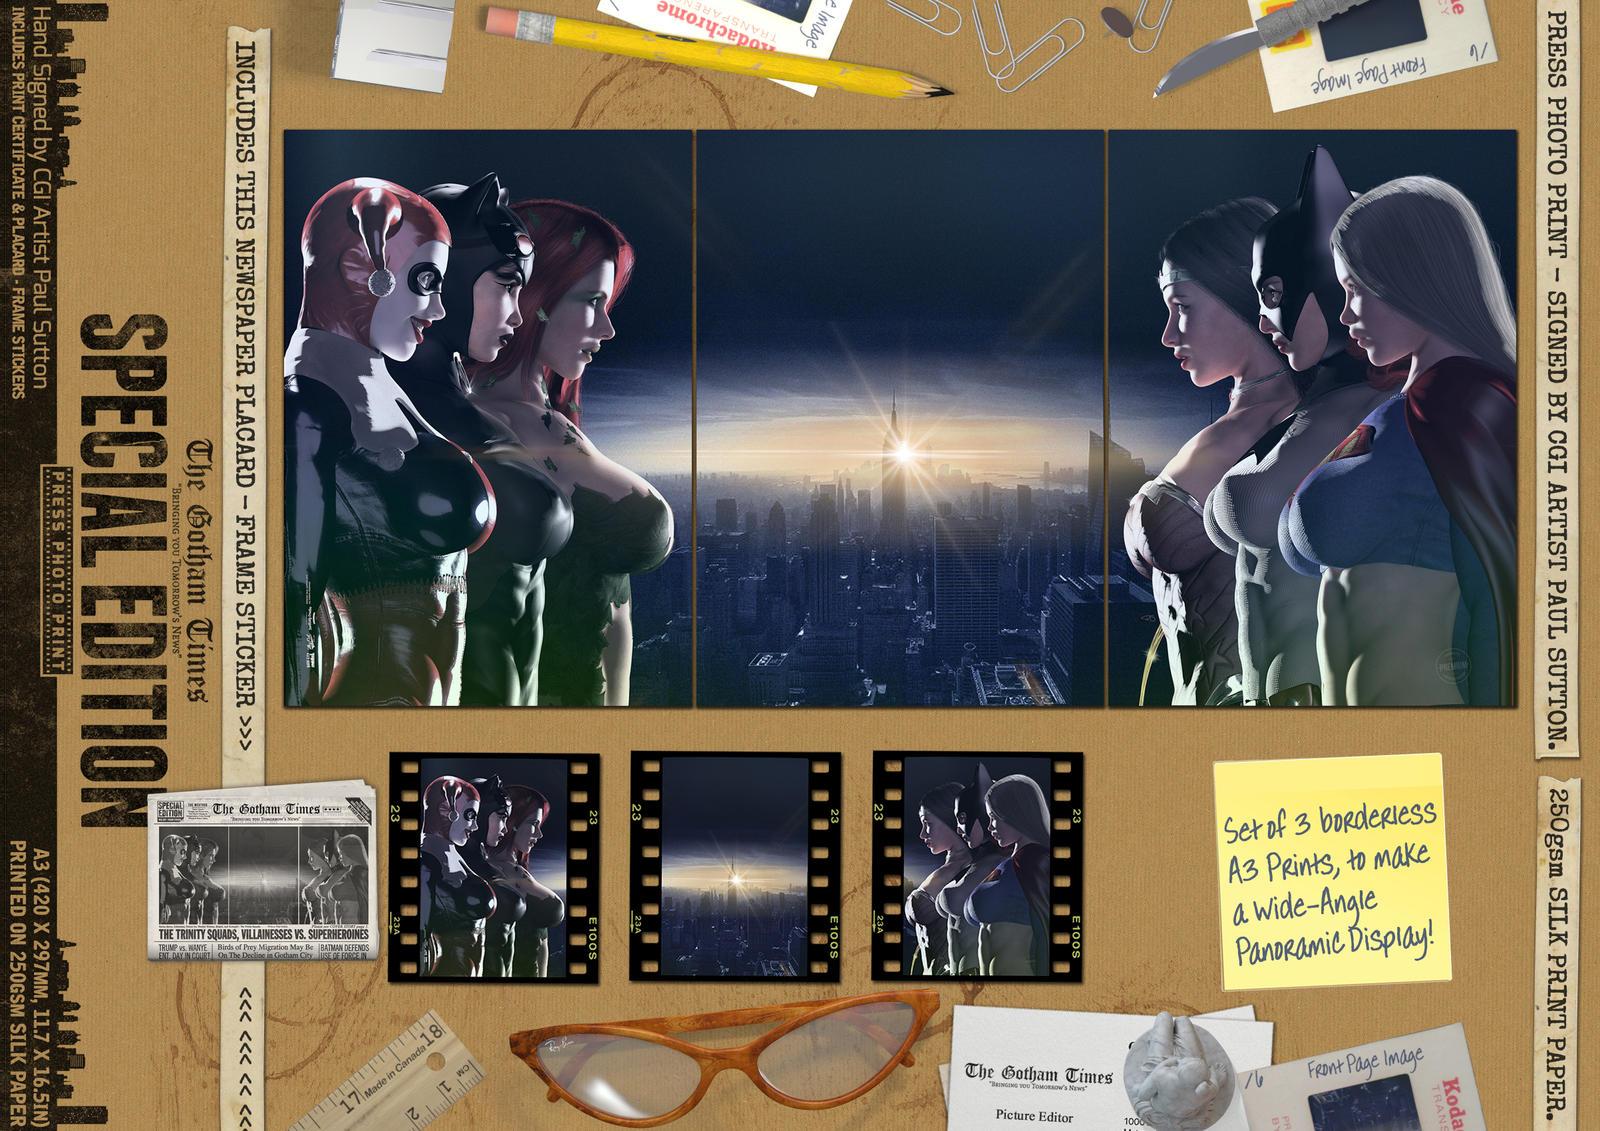 The Trinity Squads, Villainesses vs. Superheroines